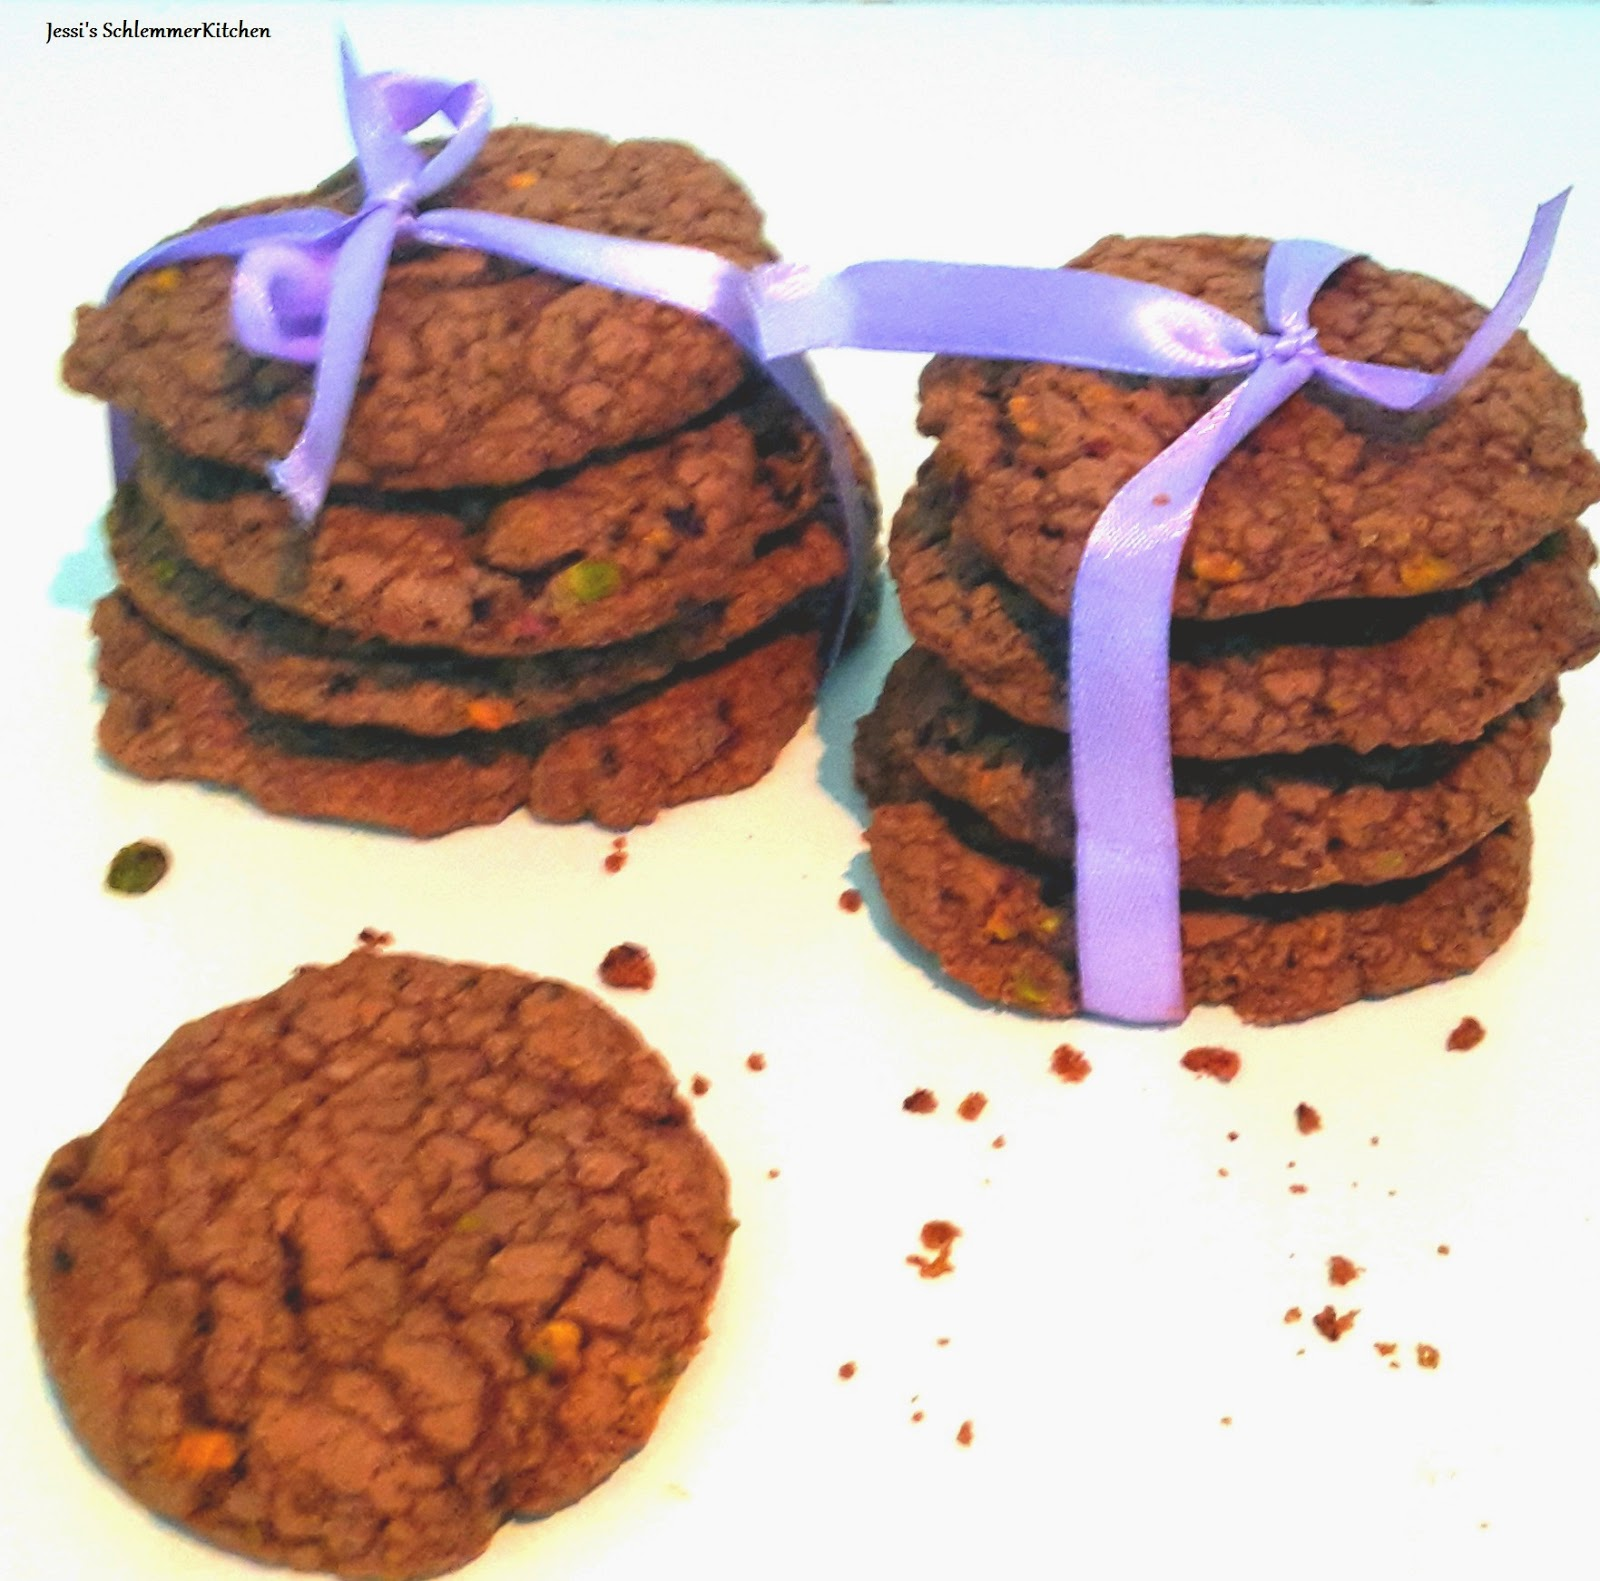 Choco-Pistachio-Cookies